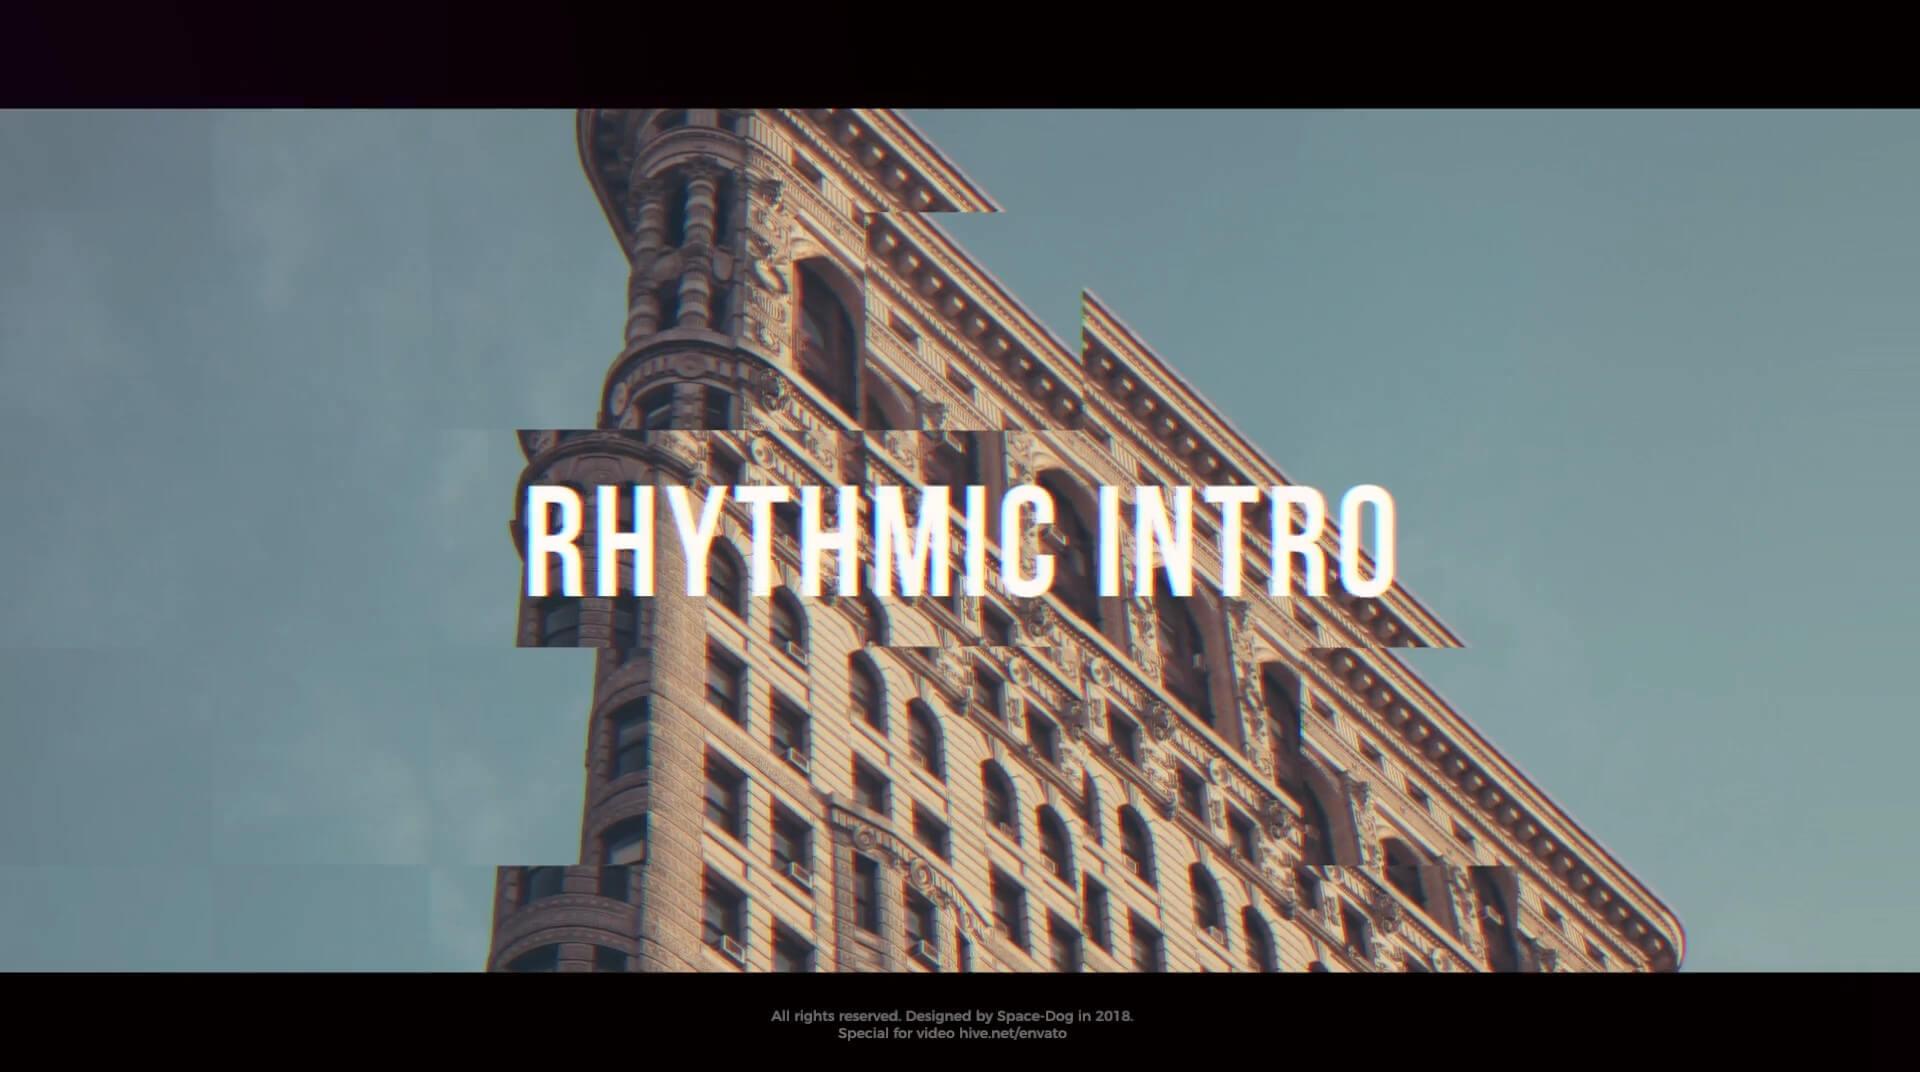 FCPX主题模板 时尚炫酷节奏快闪片头 Rhythmic Intro 兼容Motion